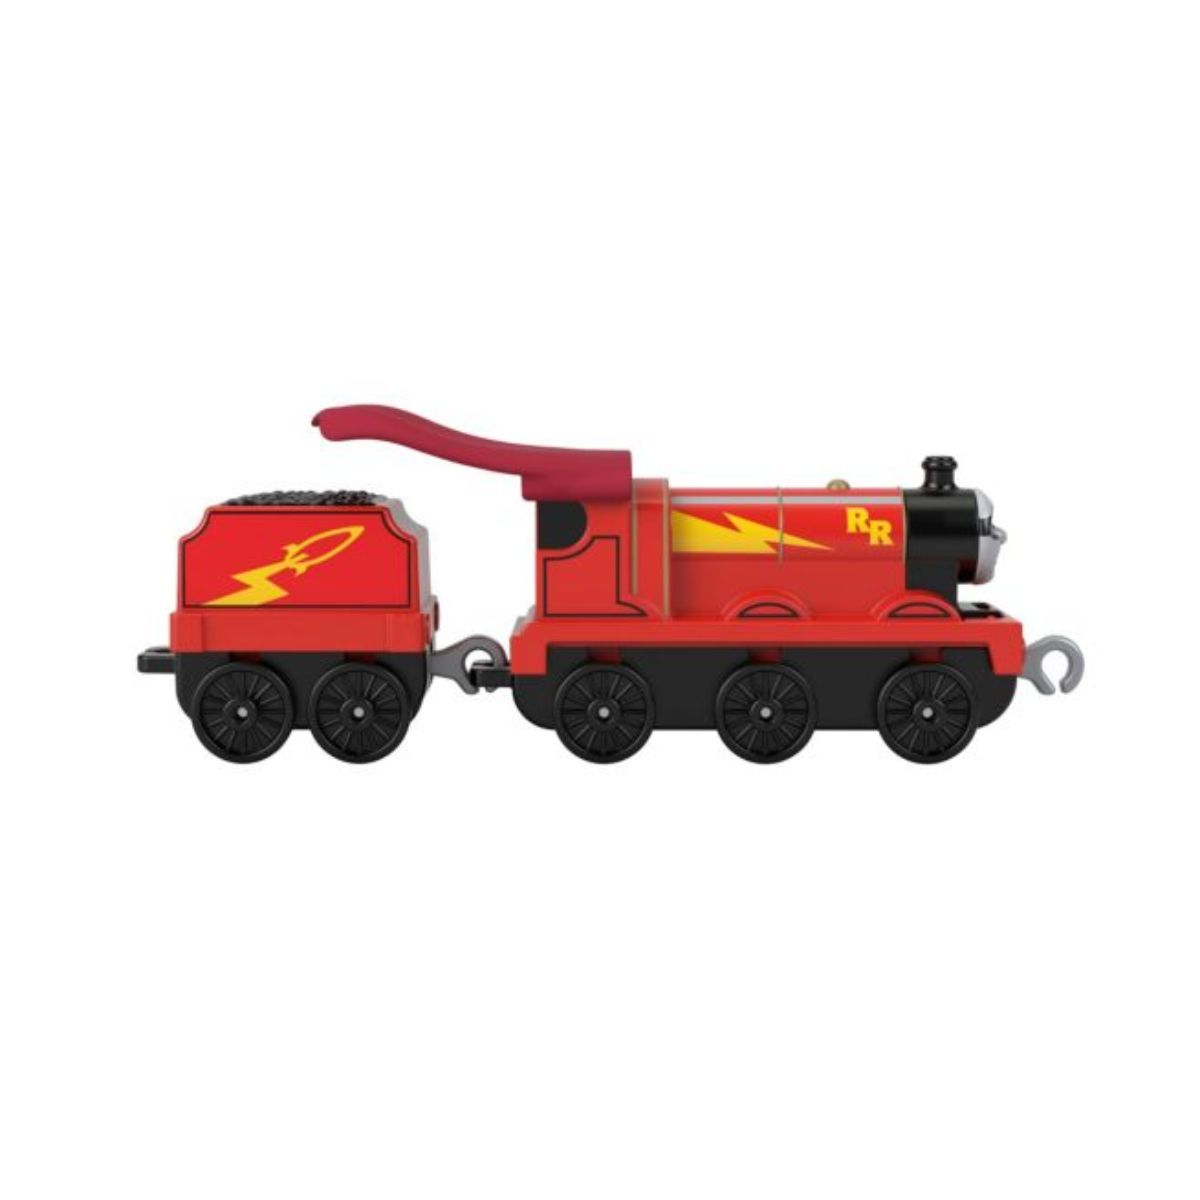 Locomotiva metalica, Thomas and Friends, James Zburatorul, GHK70